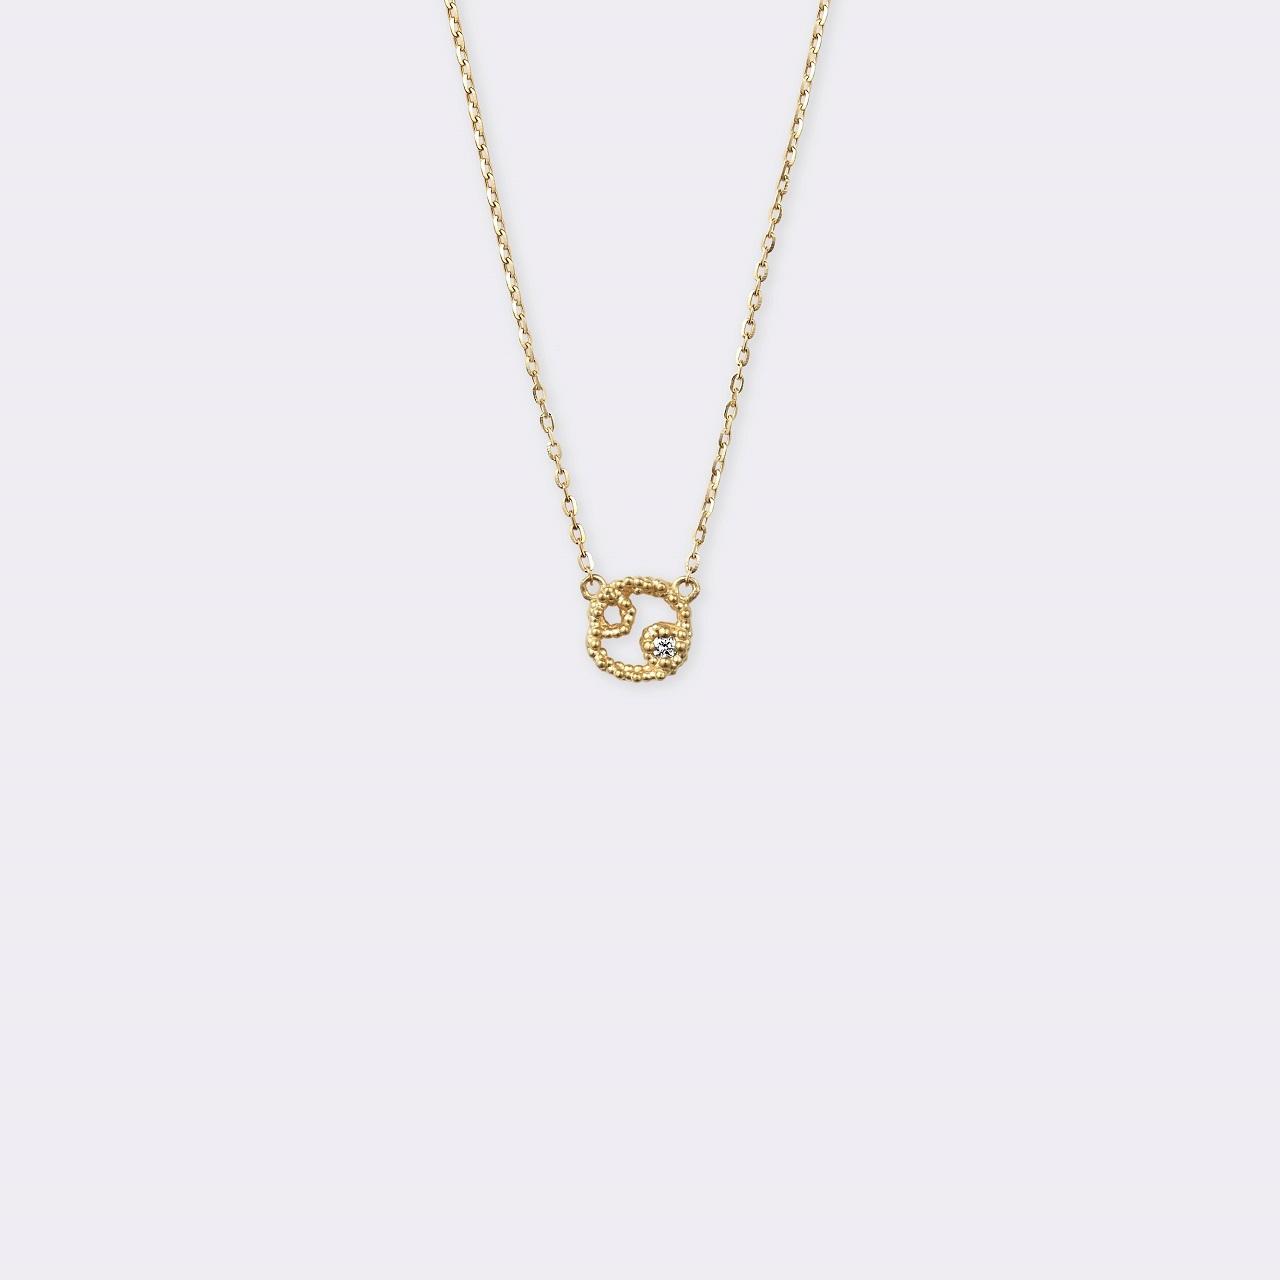 Horoscope Necklace 蟹座 K18YG(ホロスコープネックレス かに座 K18イエローゴールド)